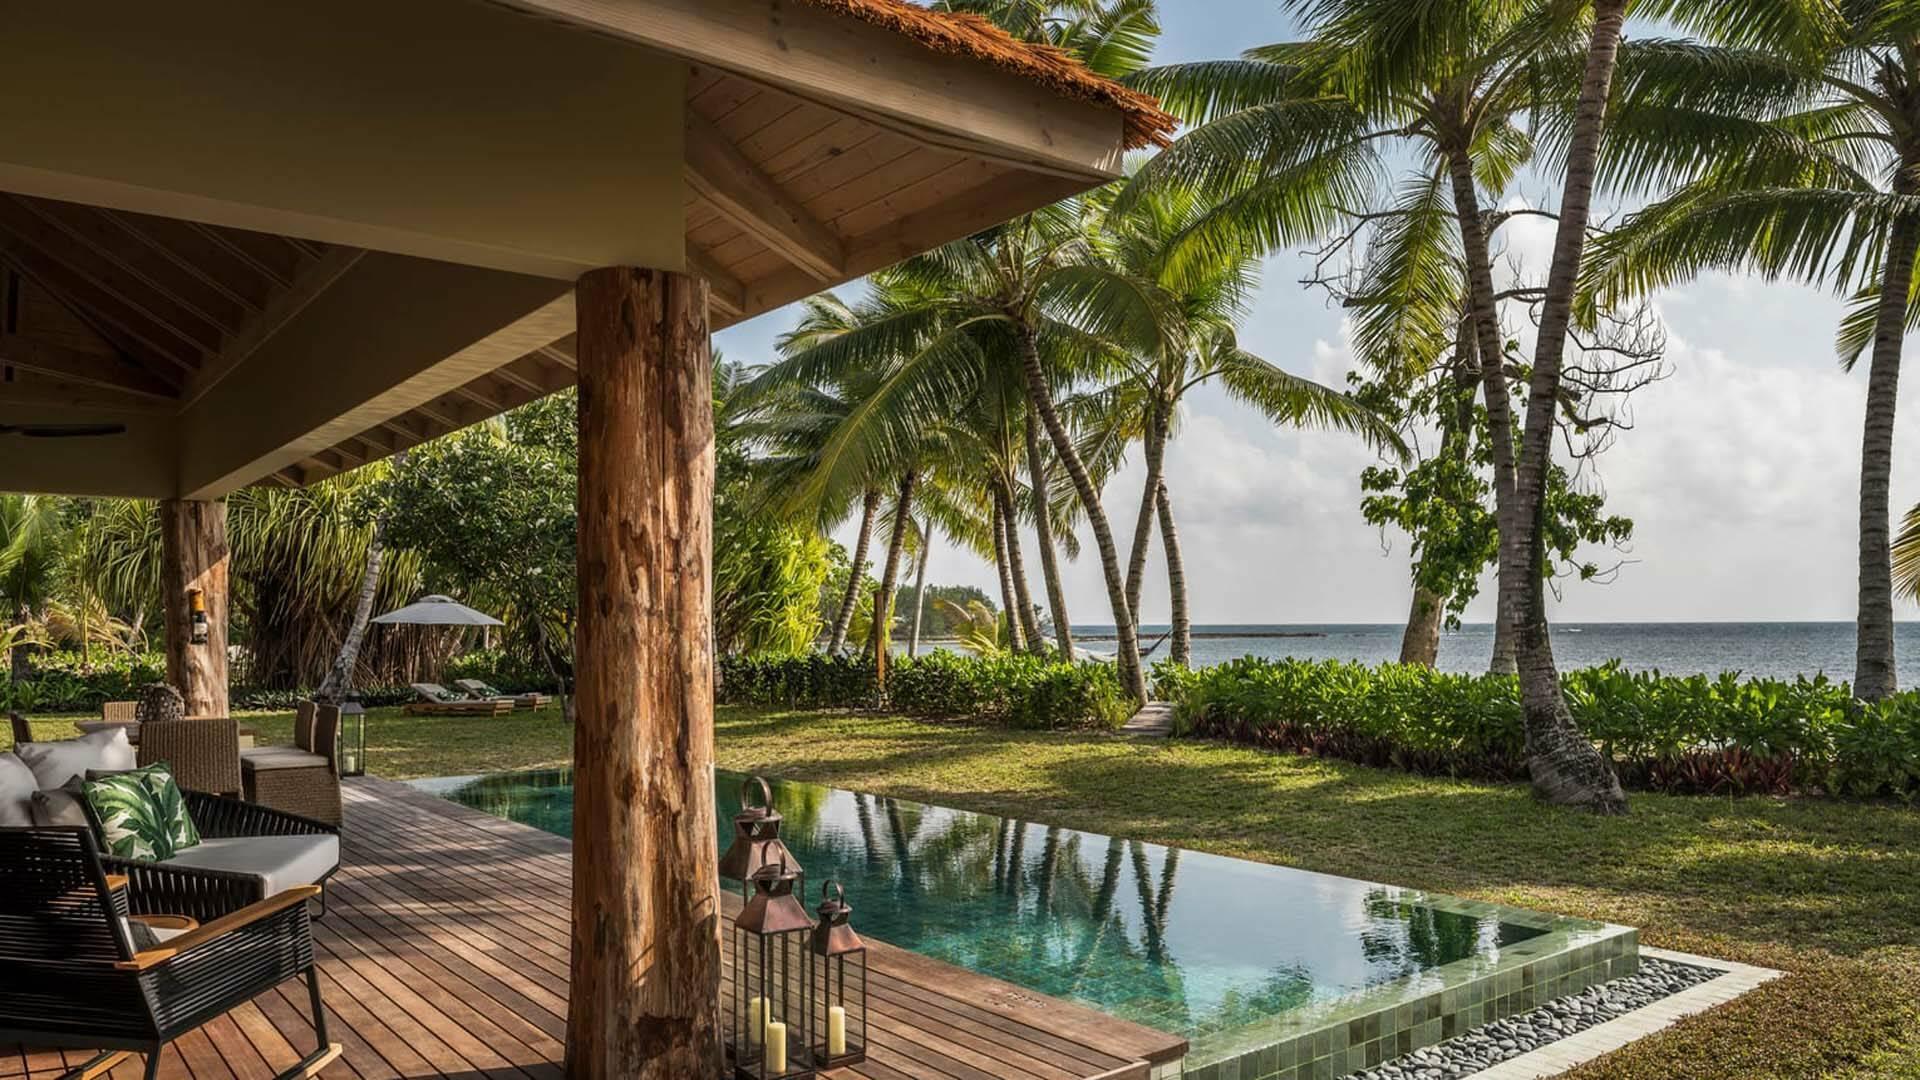 Four Seasons Desroches pool villa